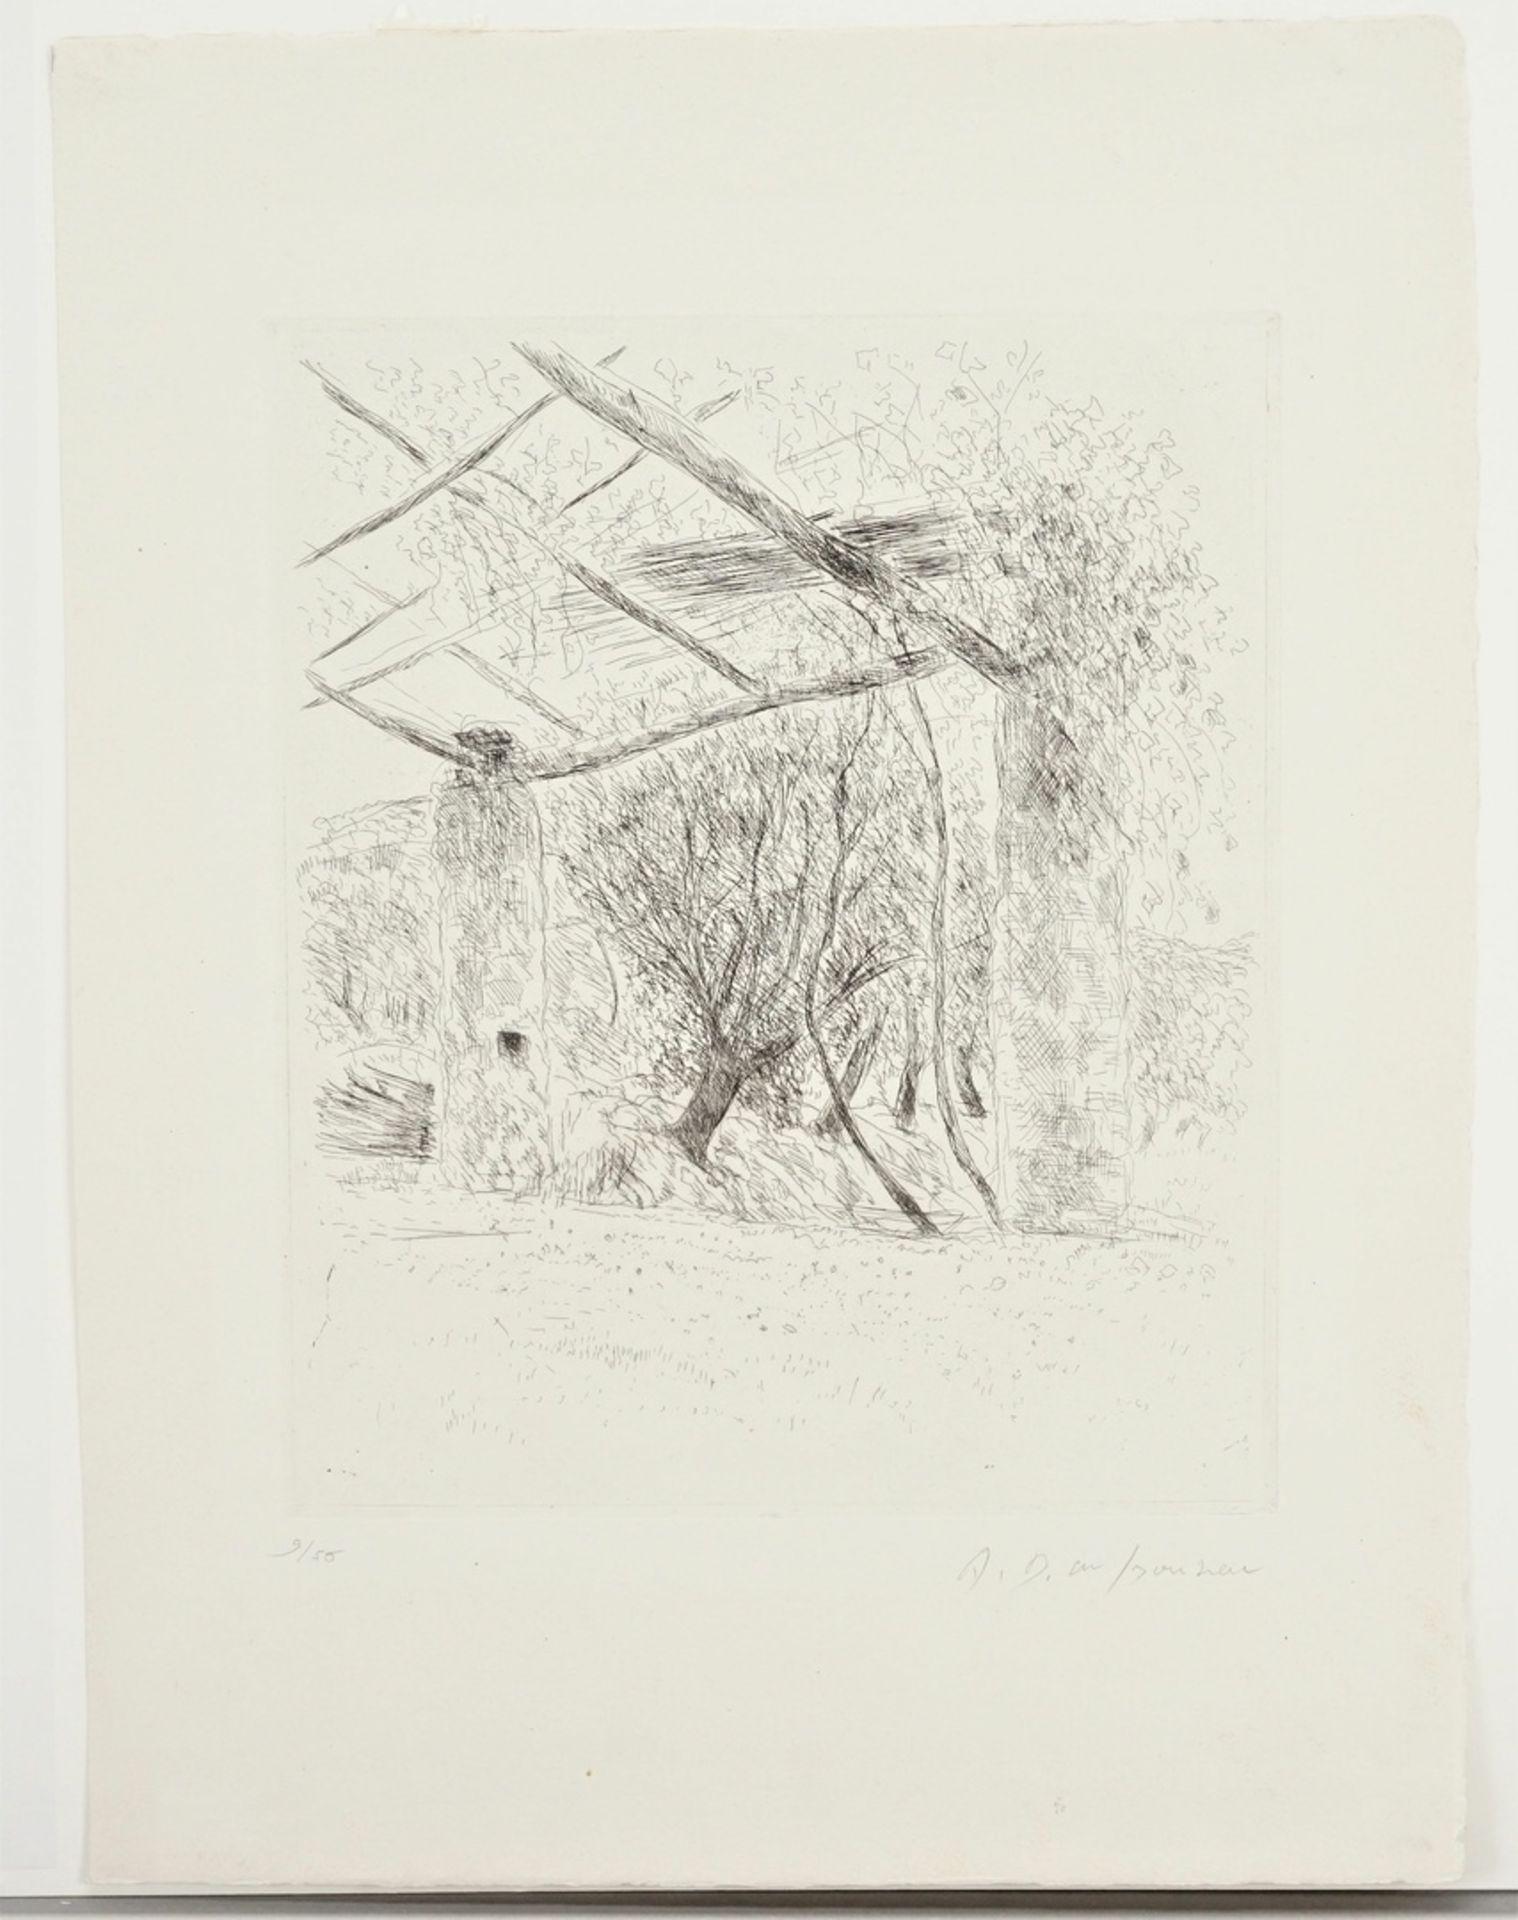 André Dunoyer De Segonzac, Gartenecke - Bild 3 aus 4